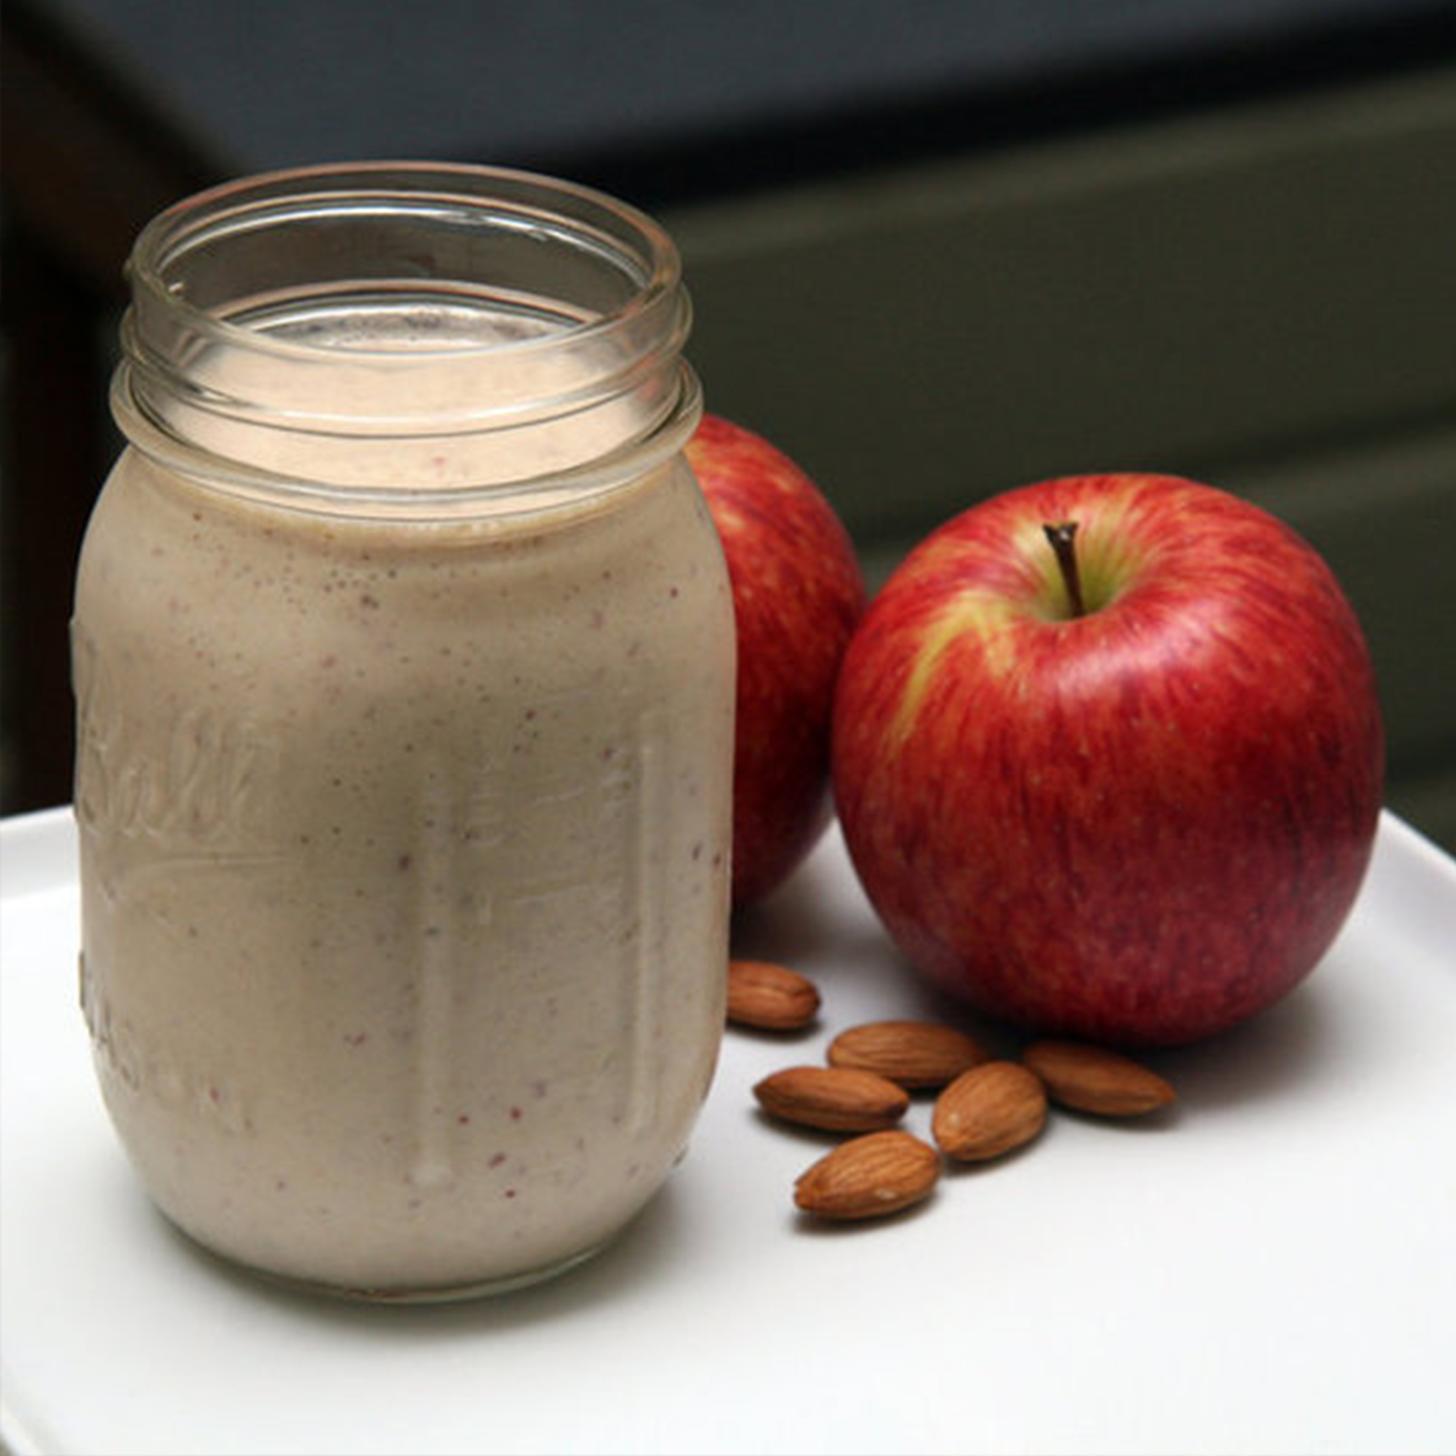 The Metabolism-Boosting Smoothie from celebrity trainer, Harley Pasternak. It has almonds, banana, apple, cinnamon, milk and yogurt.